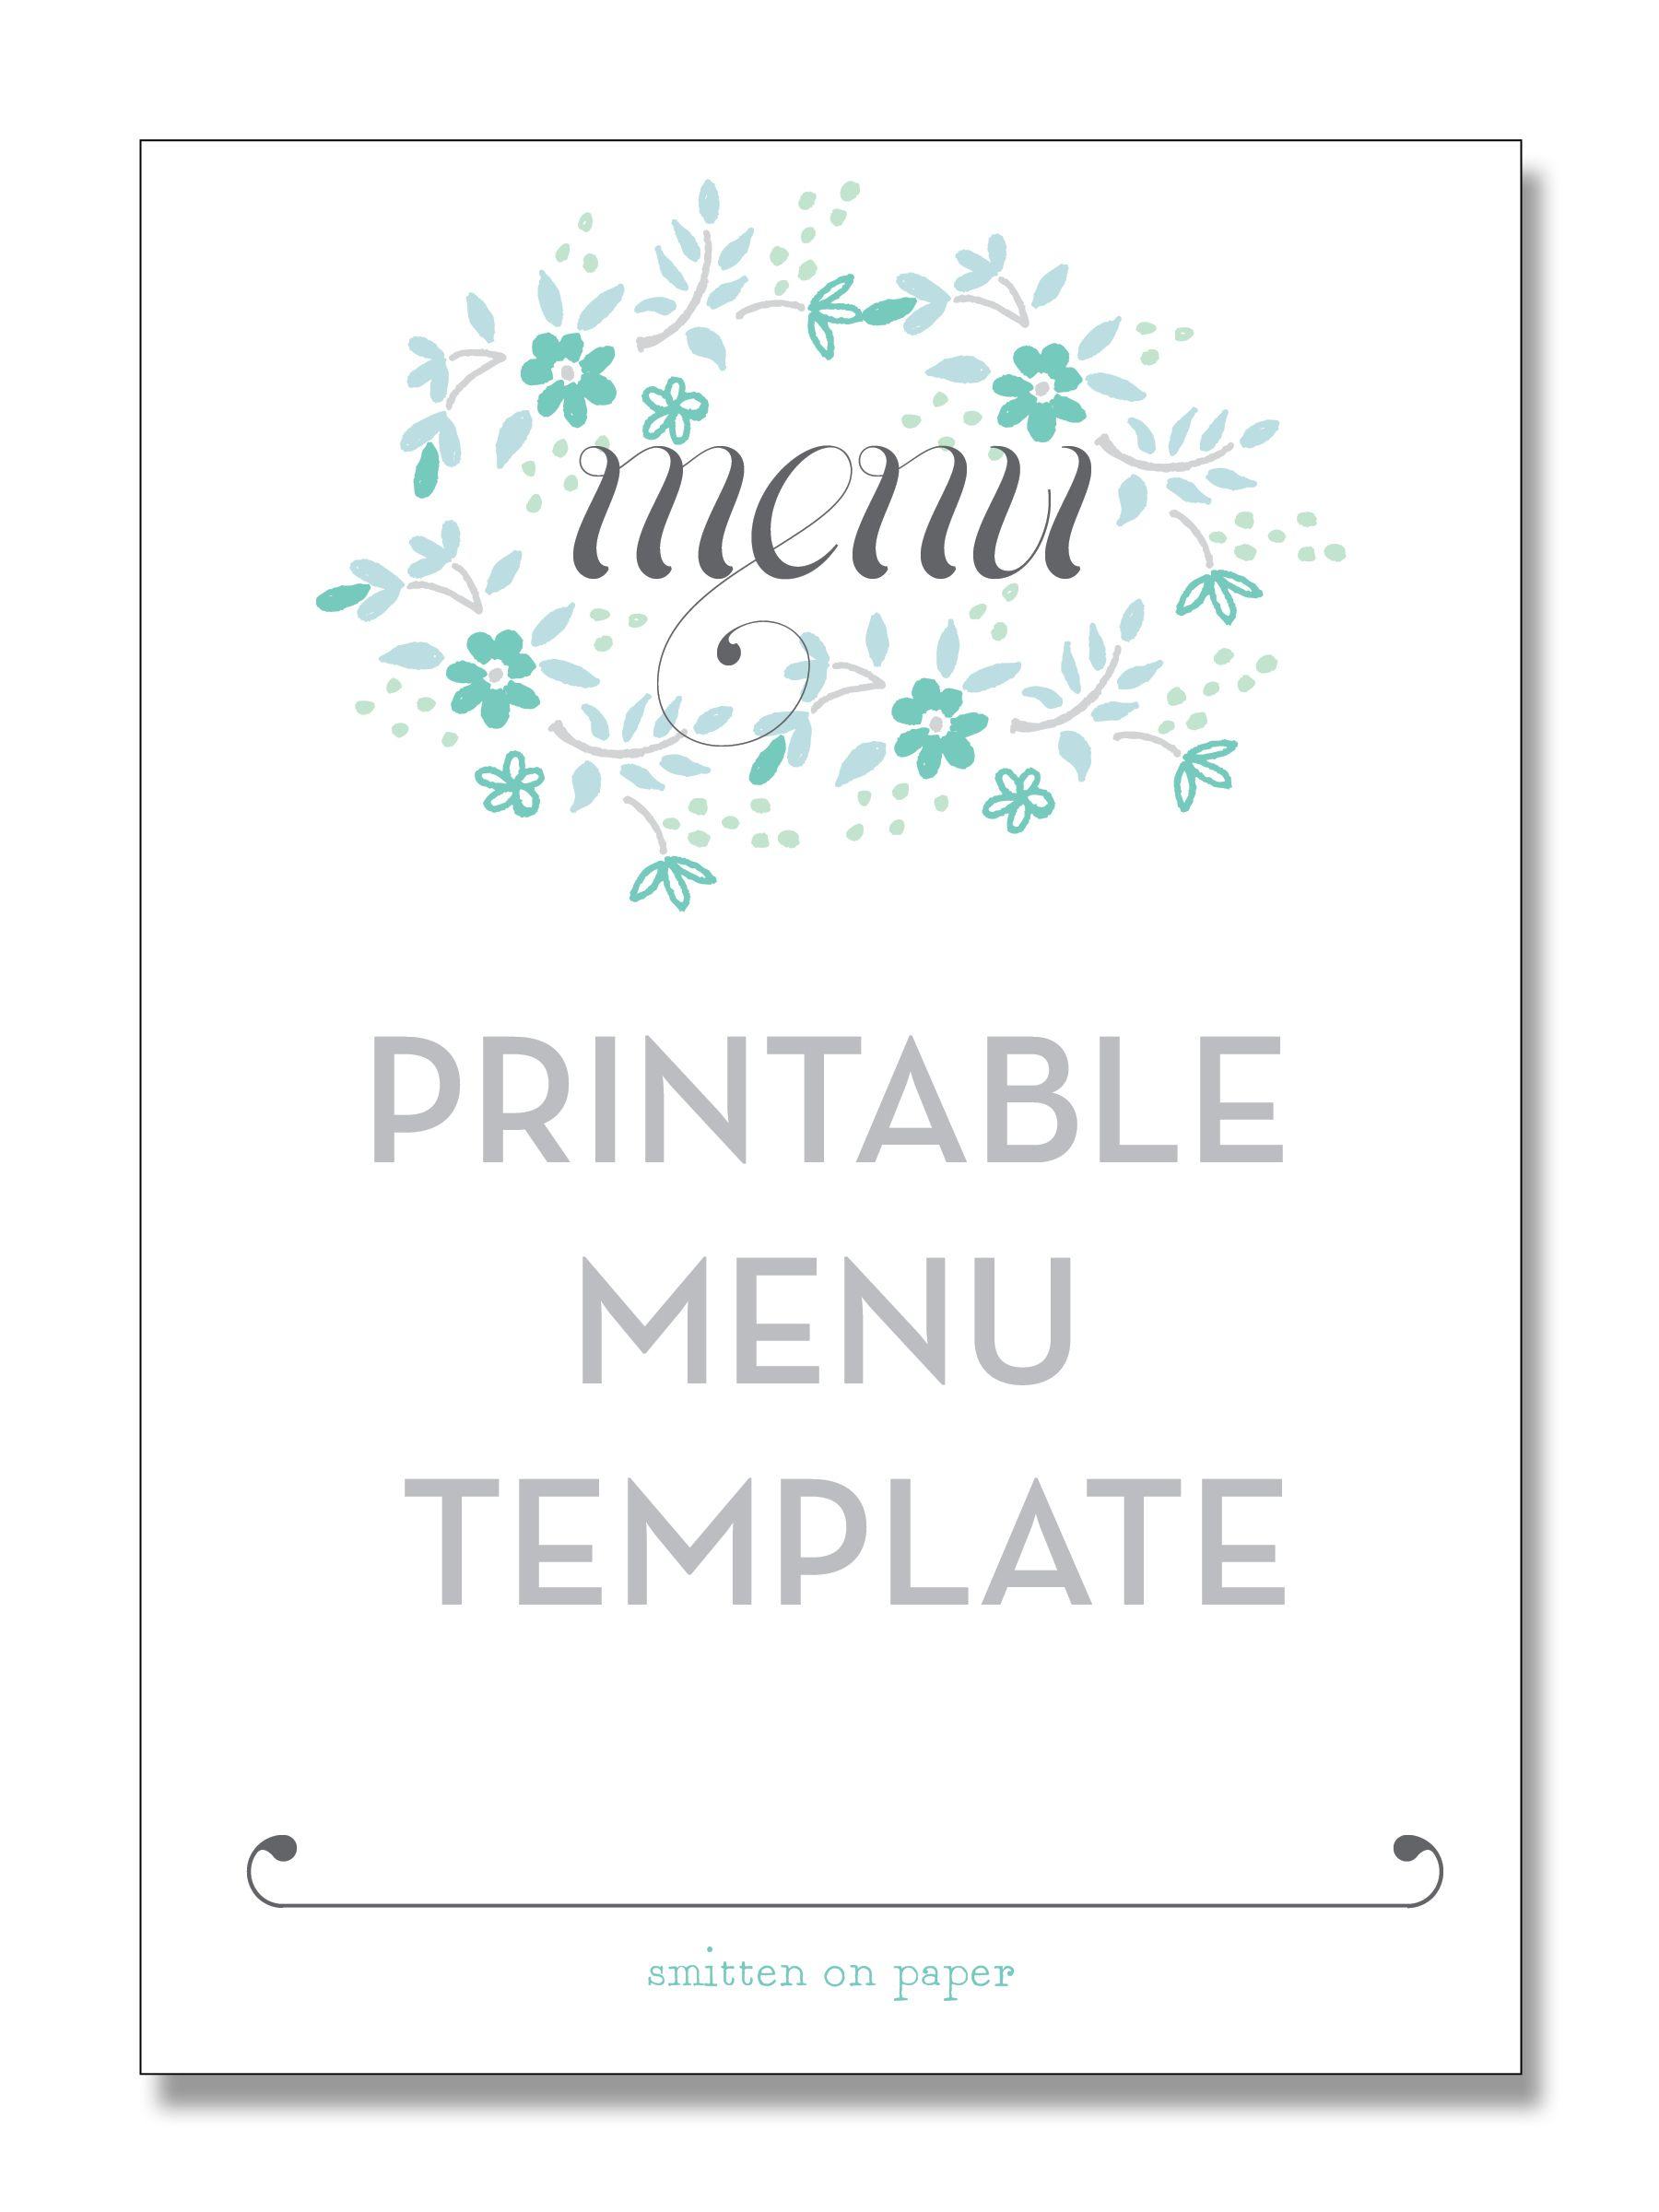 Freebie Friday: Printable Menu | Party Time! | Pinterest | Free - Free Printable Dinner Party Menu Template